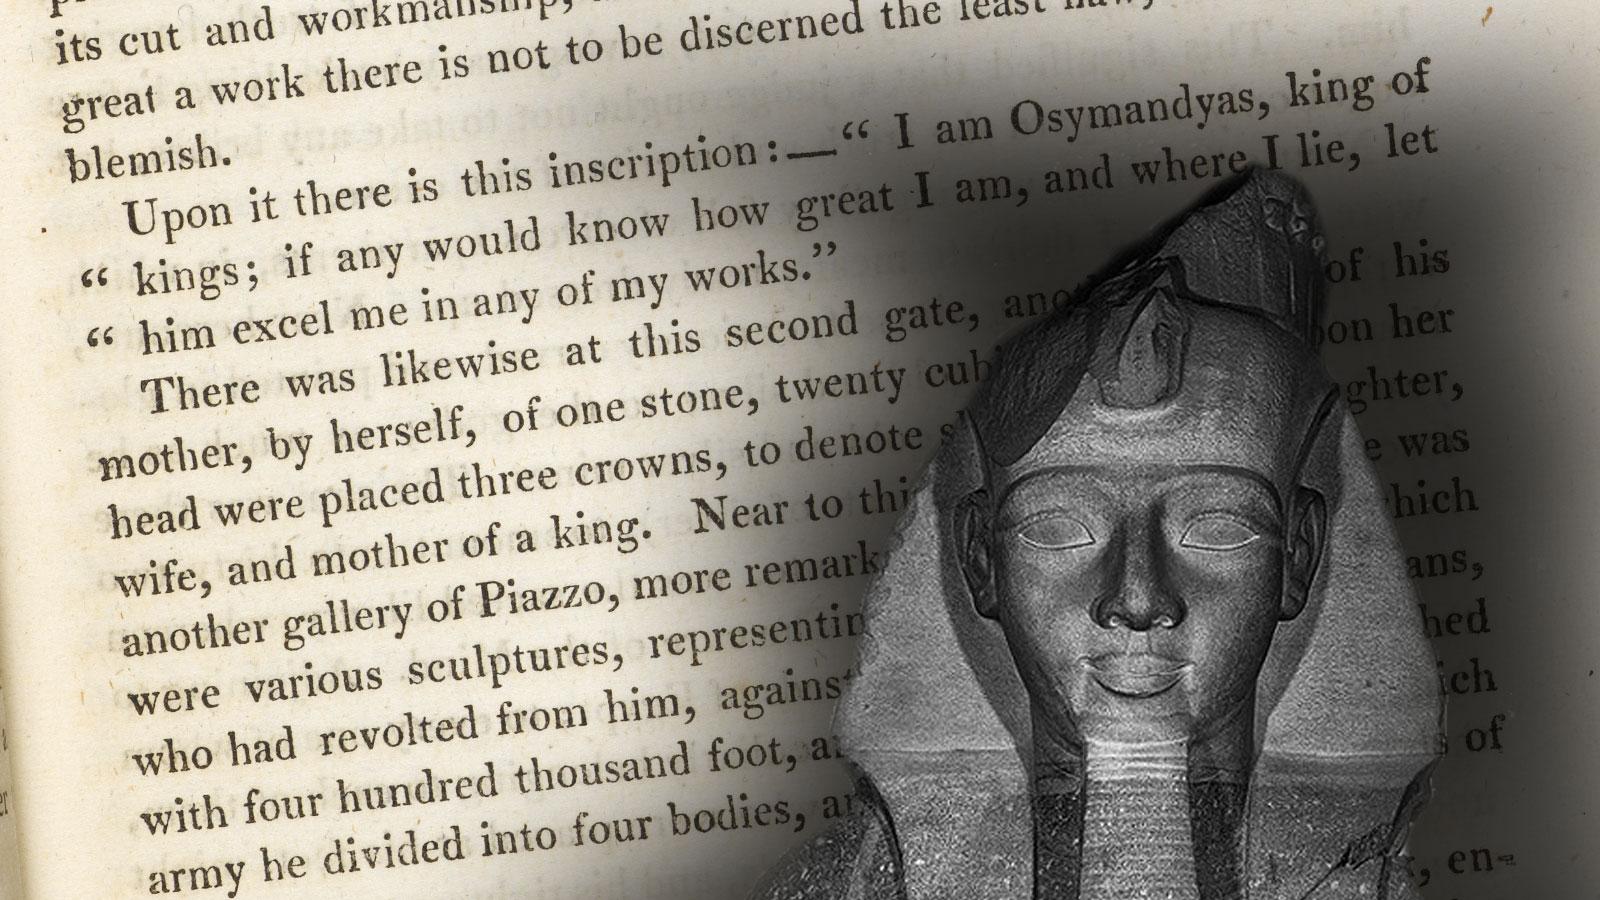 An introduction to 'Ozymandias'